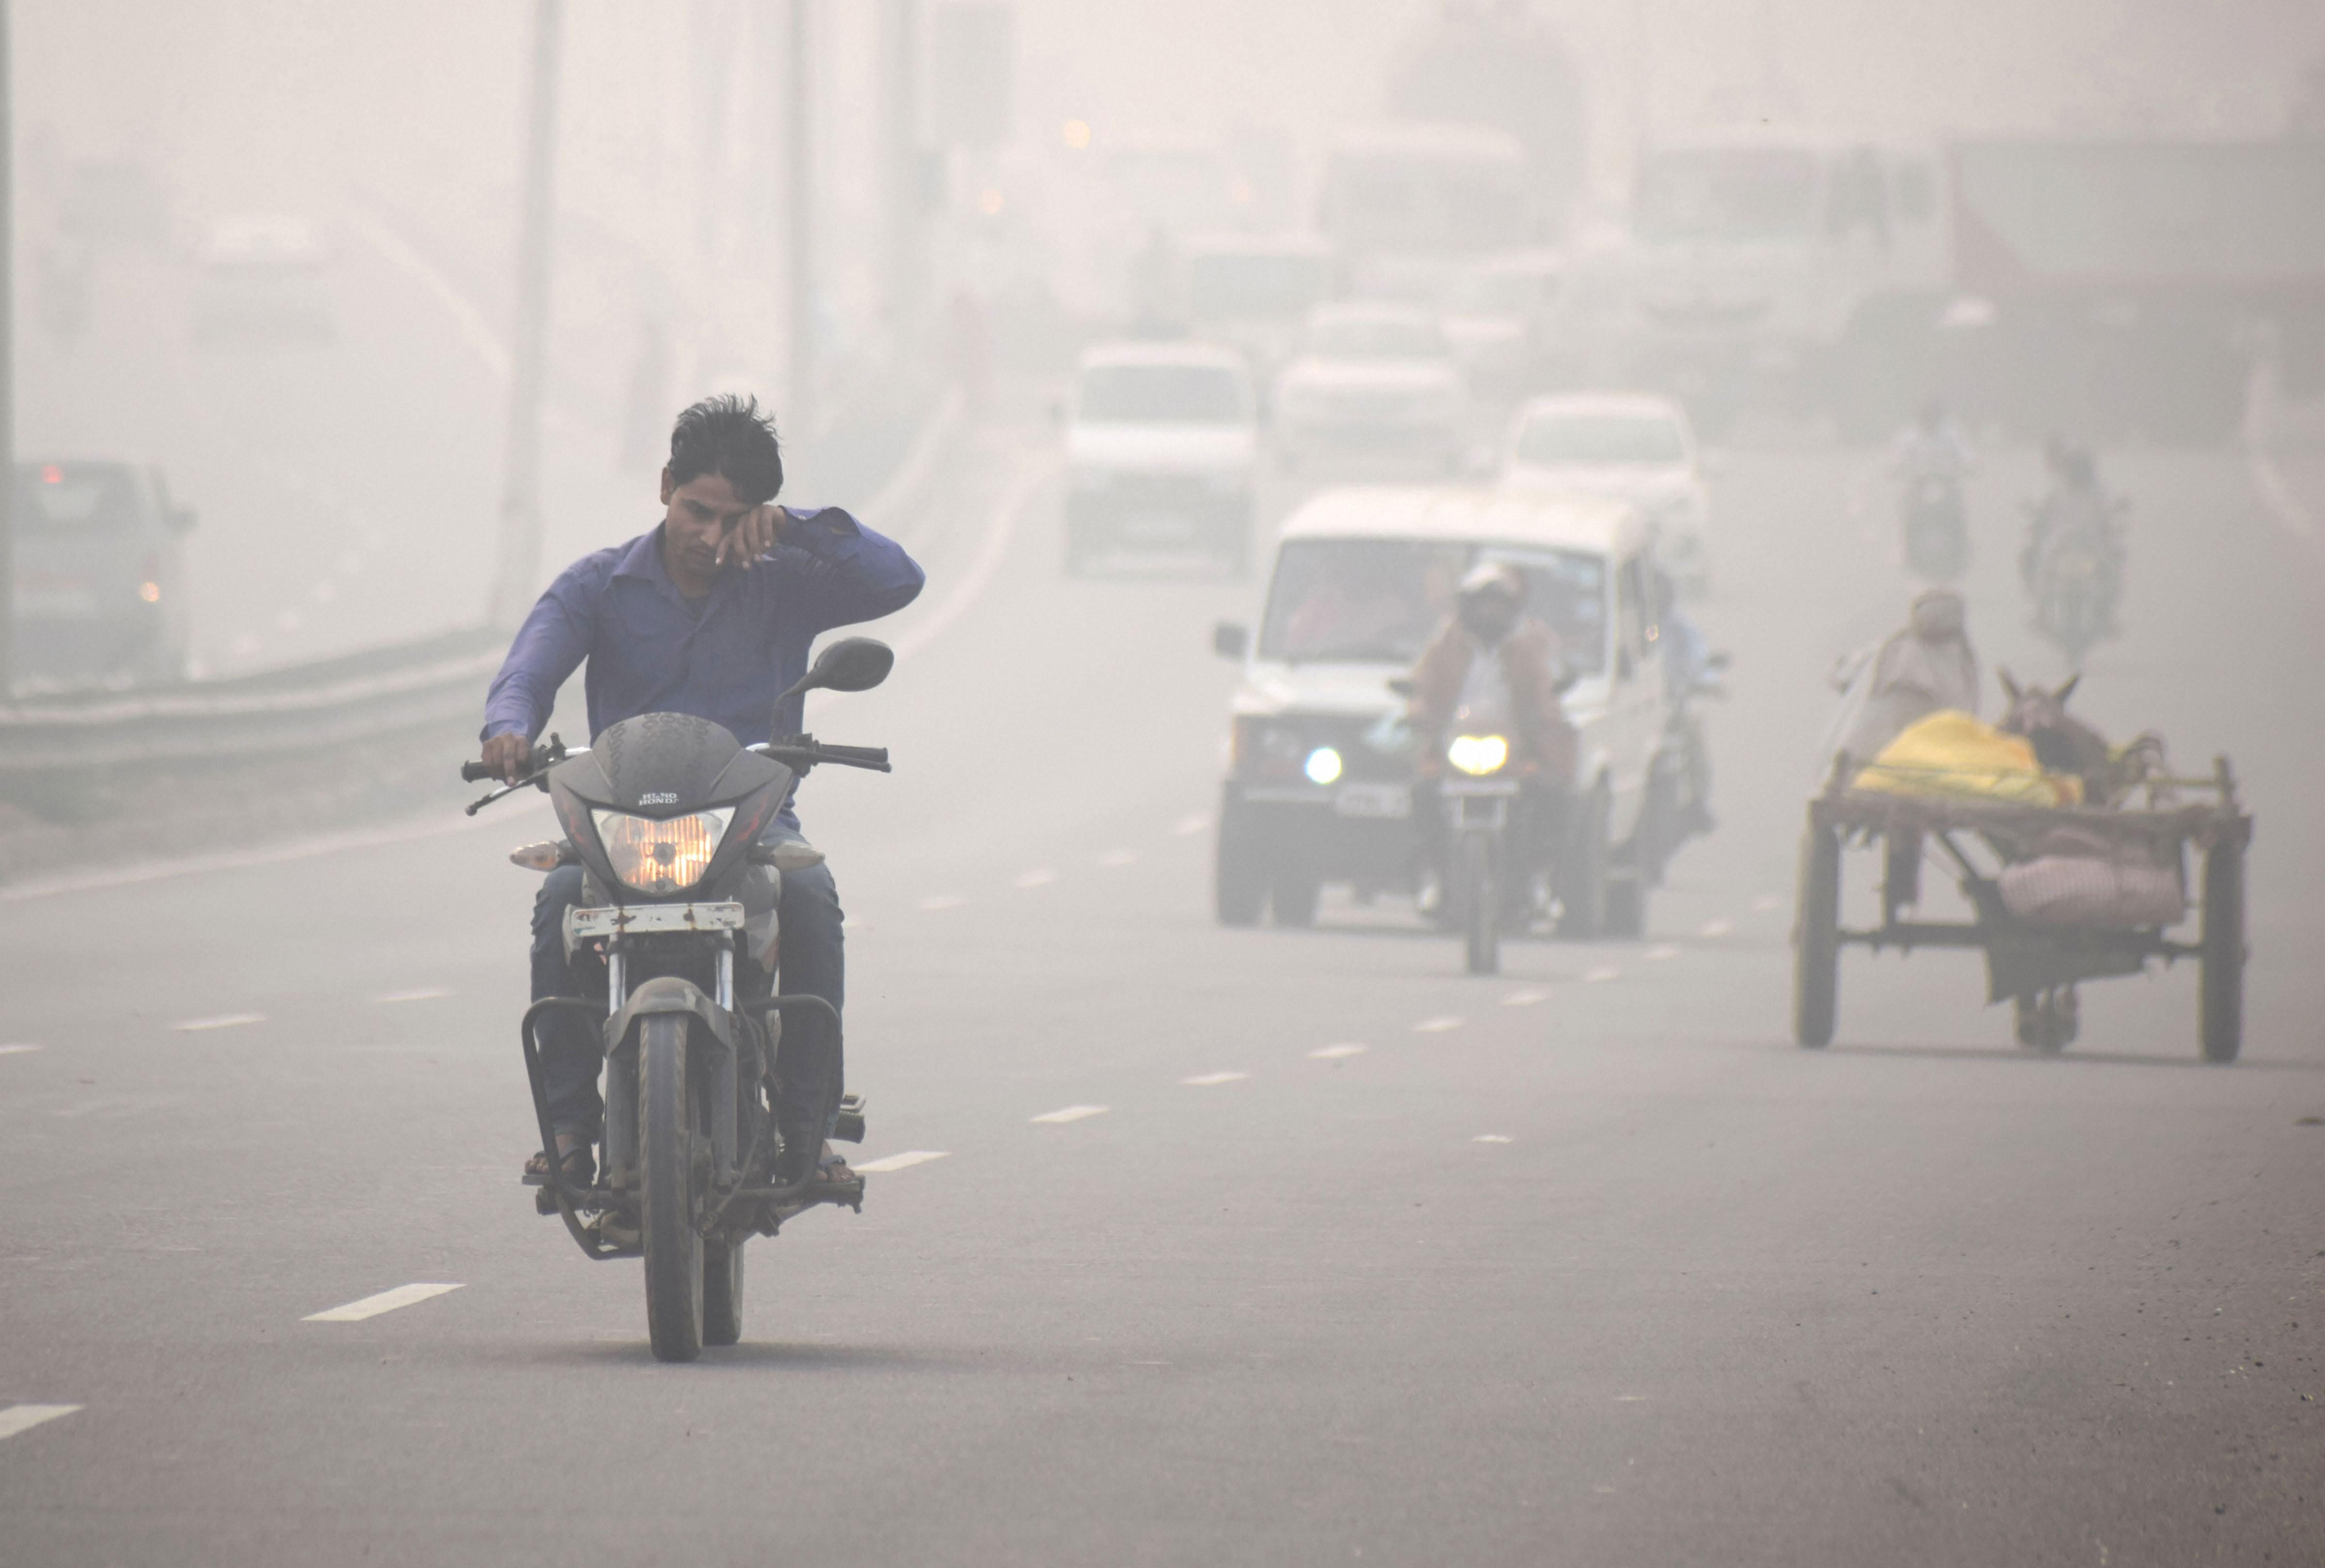 A motorcyclist rides through thick smog on NH-2, in Mathura, Sunday, November 03, 2019.